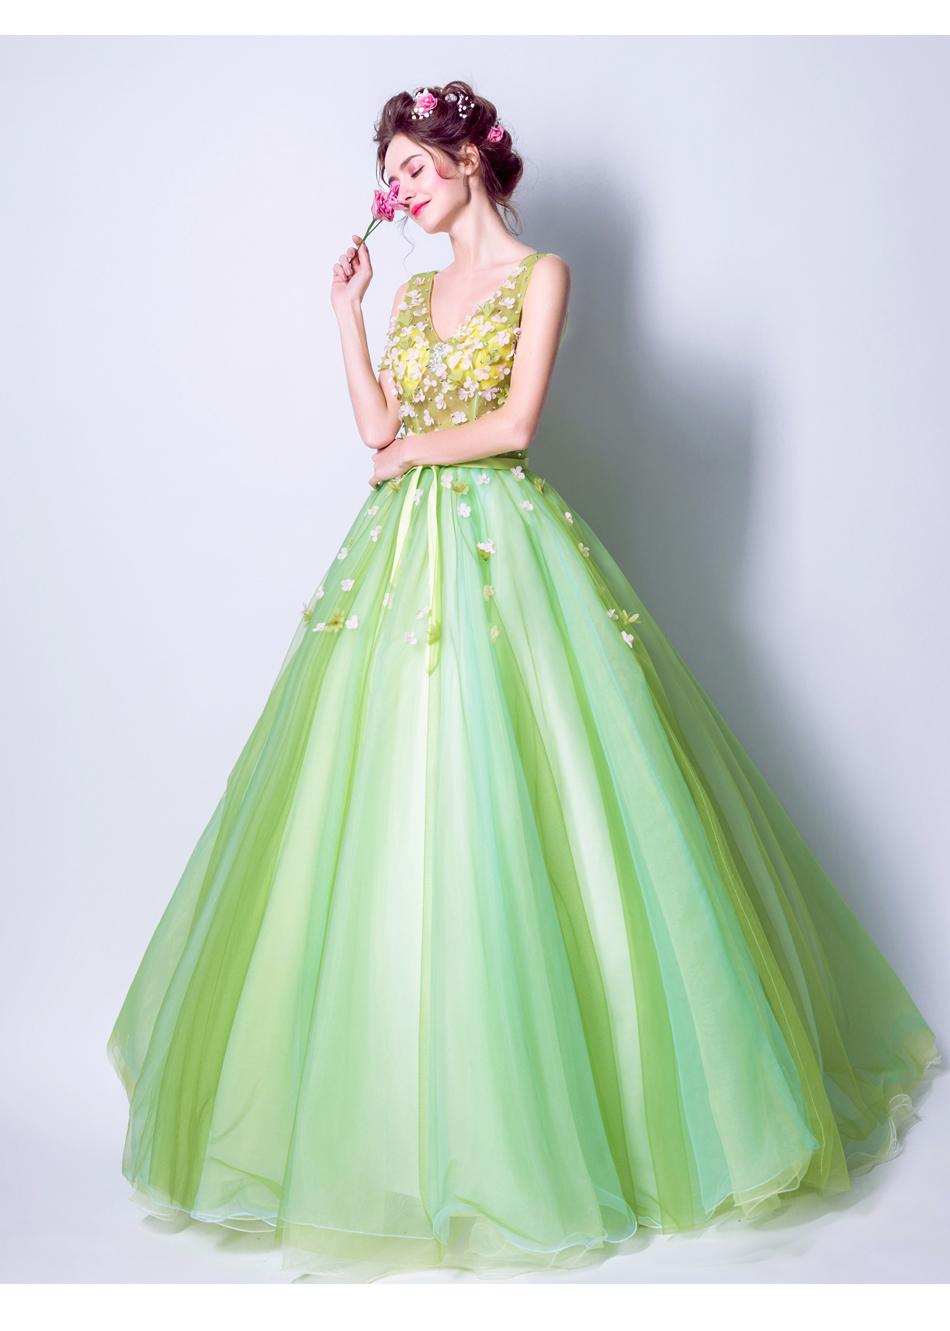 Angel Wedding Dress Marriage Bride Bridal Gown Vestido De Noiva 2017Soft powder, Qingjian Lvxian beauty, petals, green 9718 18